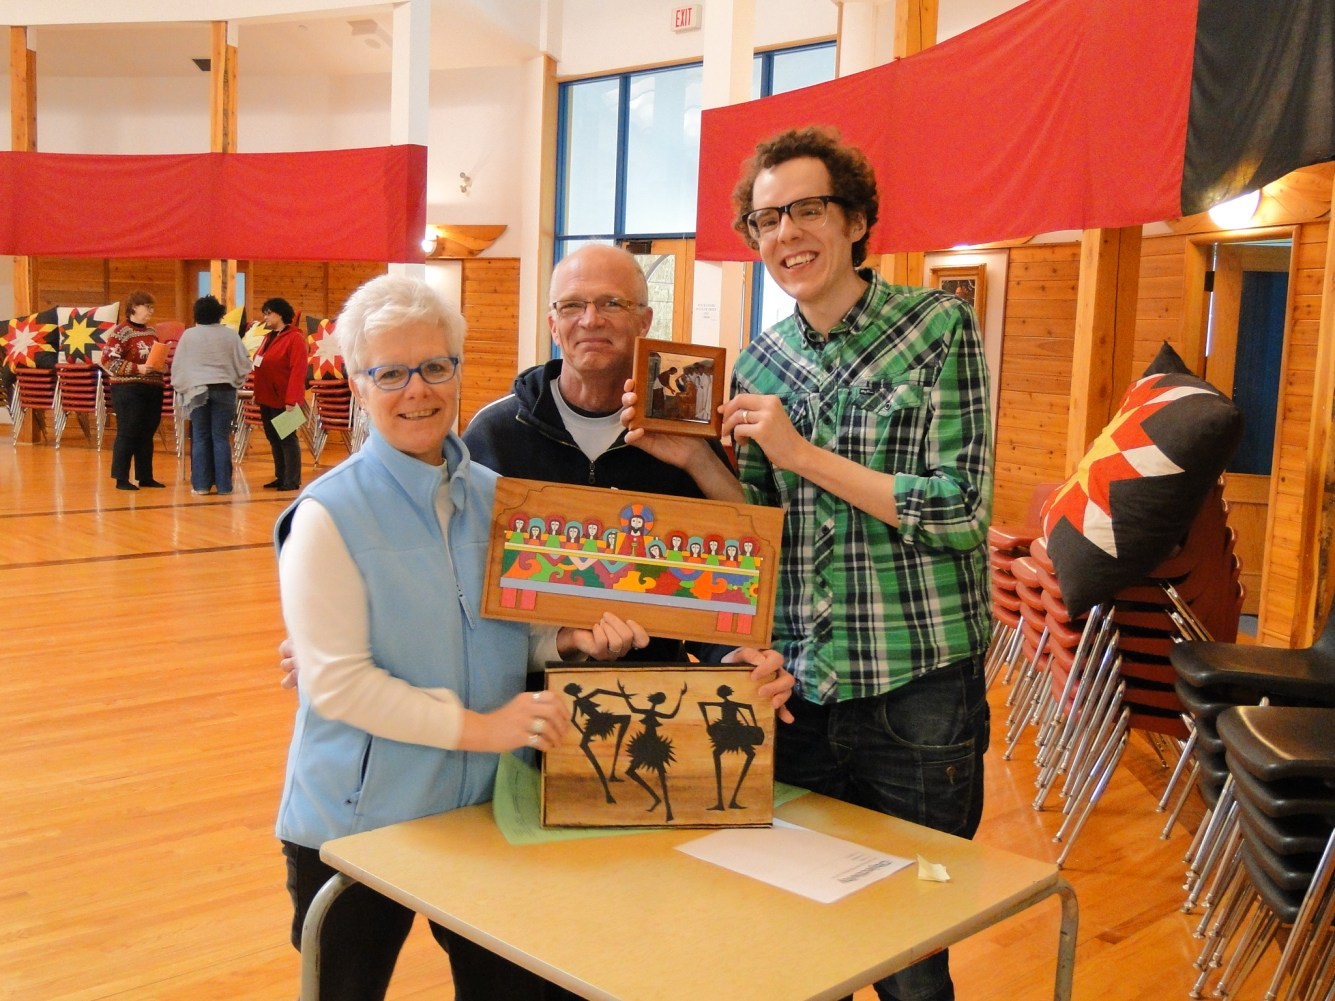 Lynn, Ian, and Josh play art critic